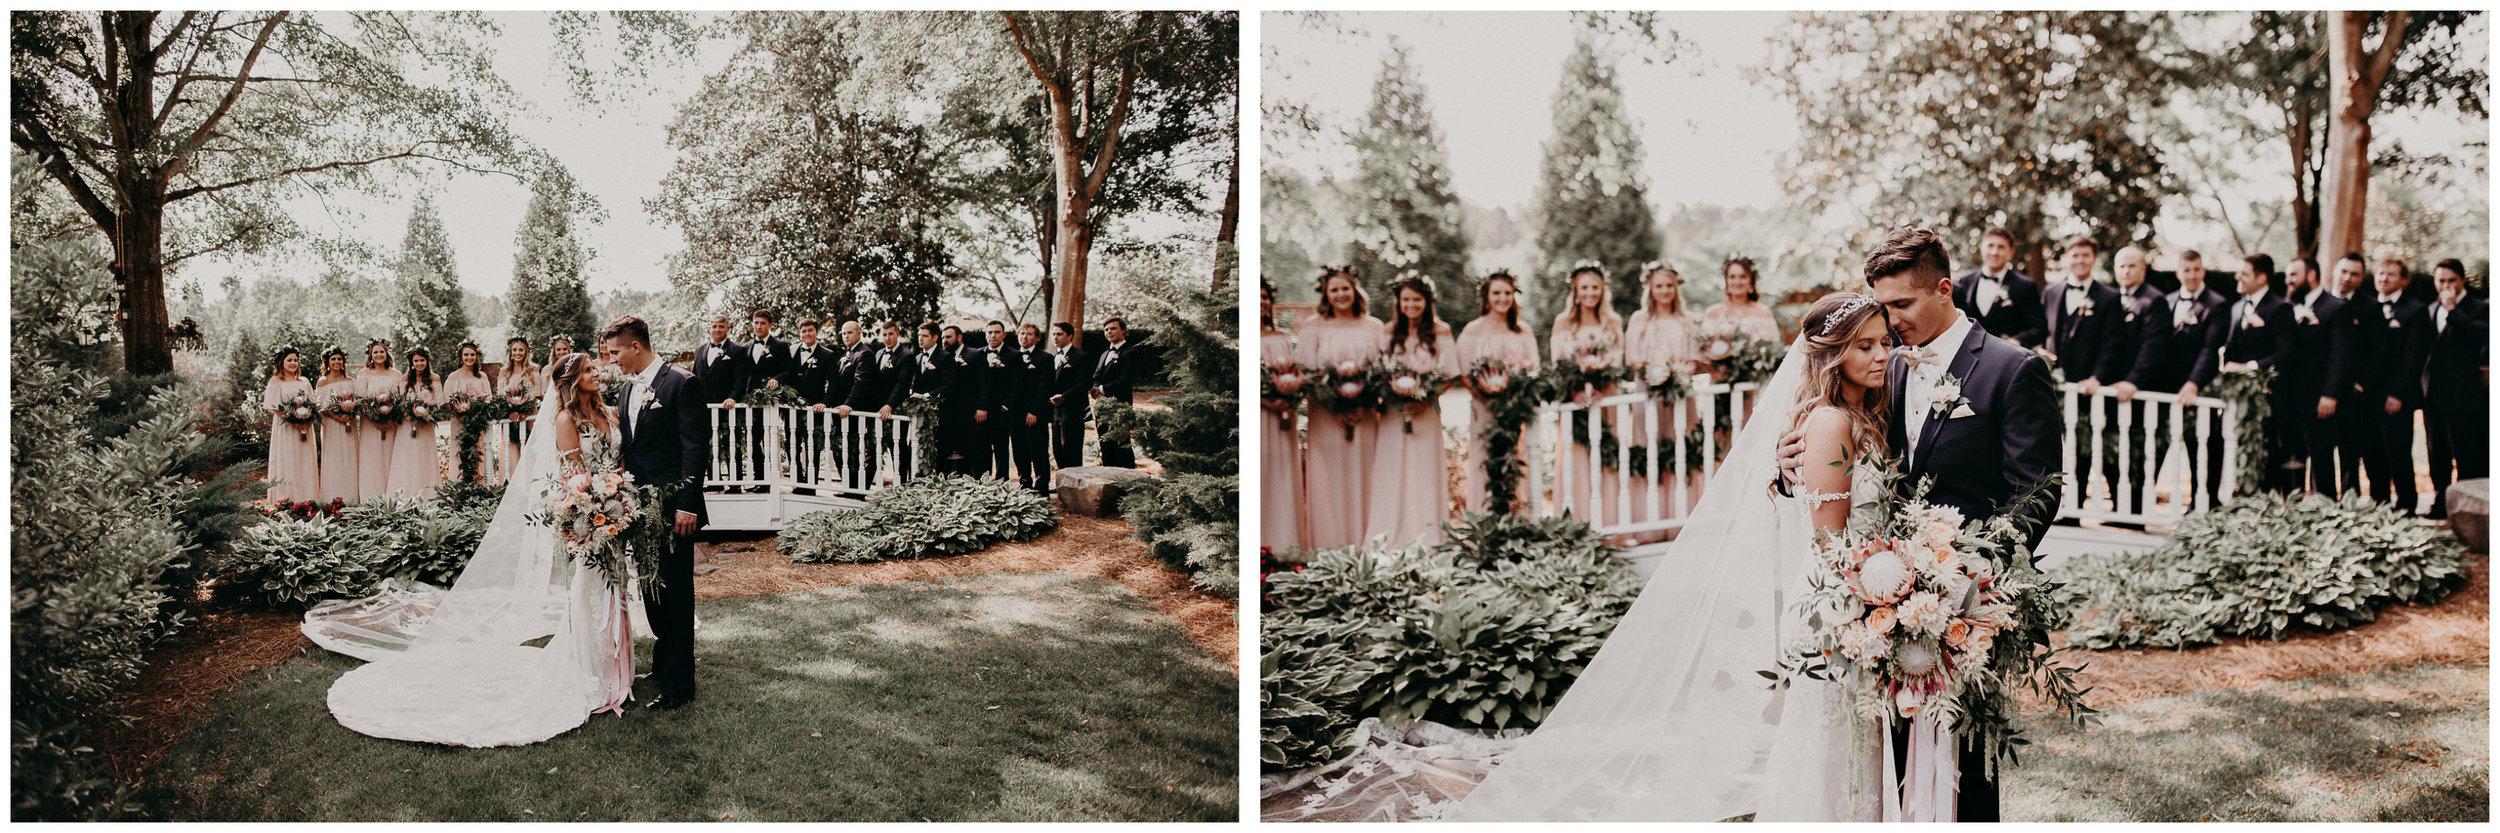 46Carl House Wedding Venue Ga, Atlanta Wedding Photographer - Boho, Bohemian, Junebug Weddings, Vintage, Retro, Trendy. Aline Marin Photography. .jpg